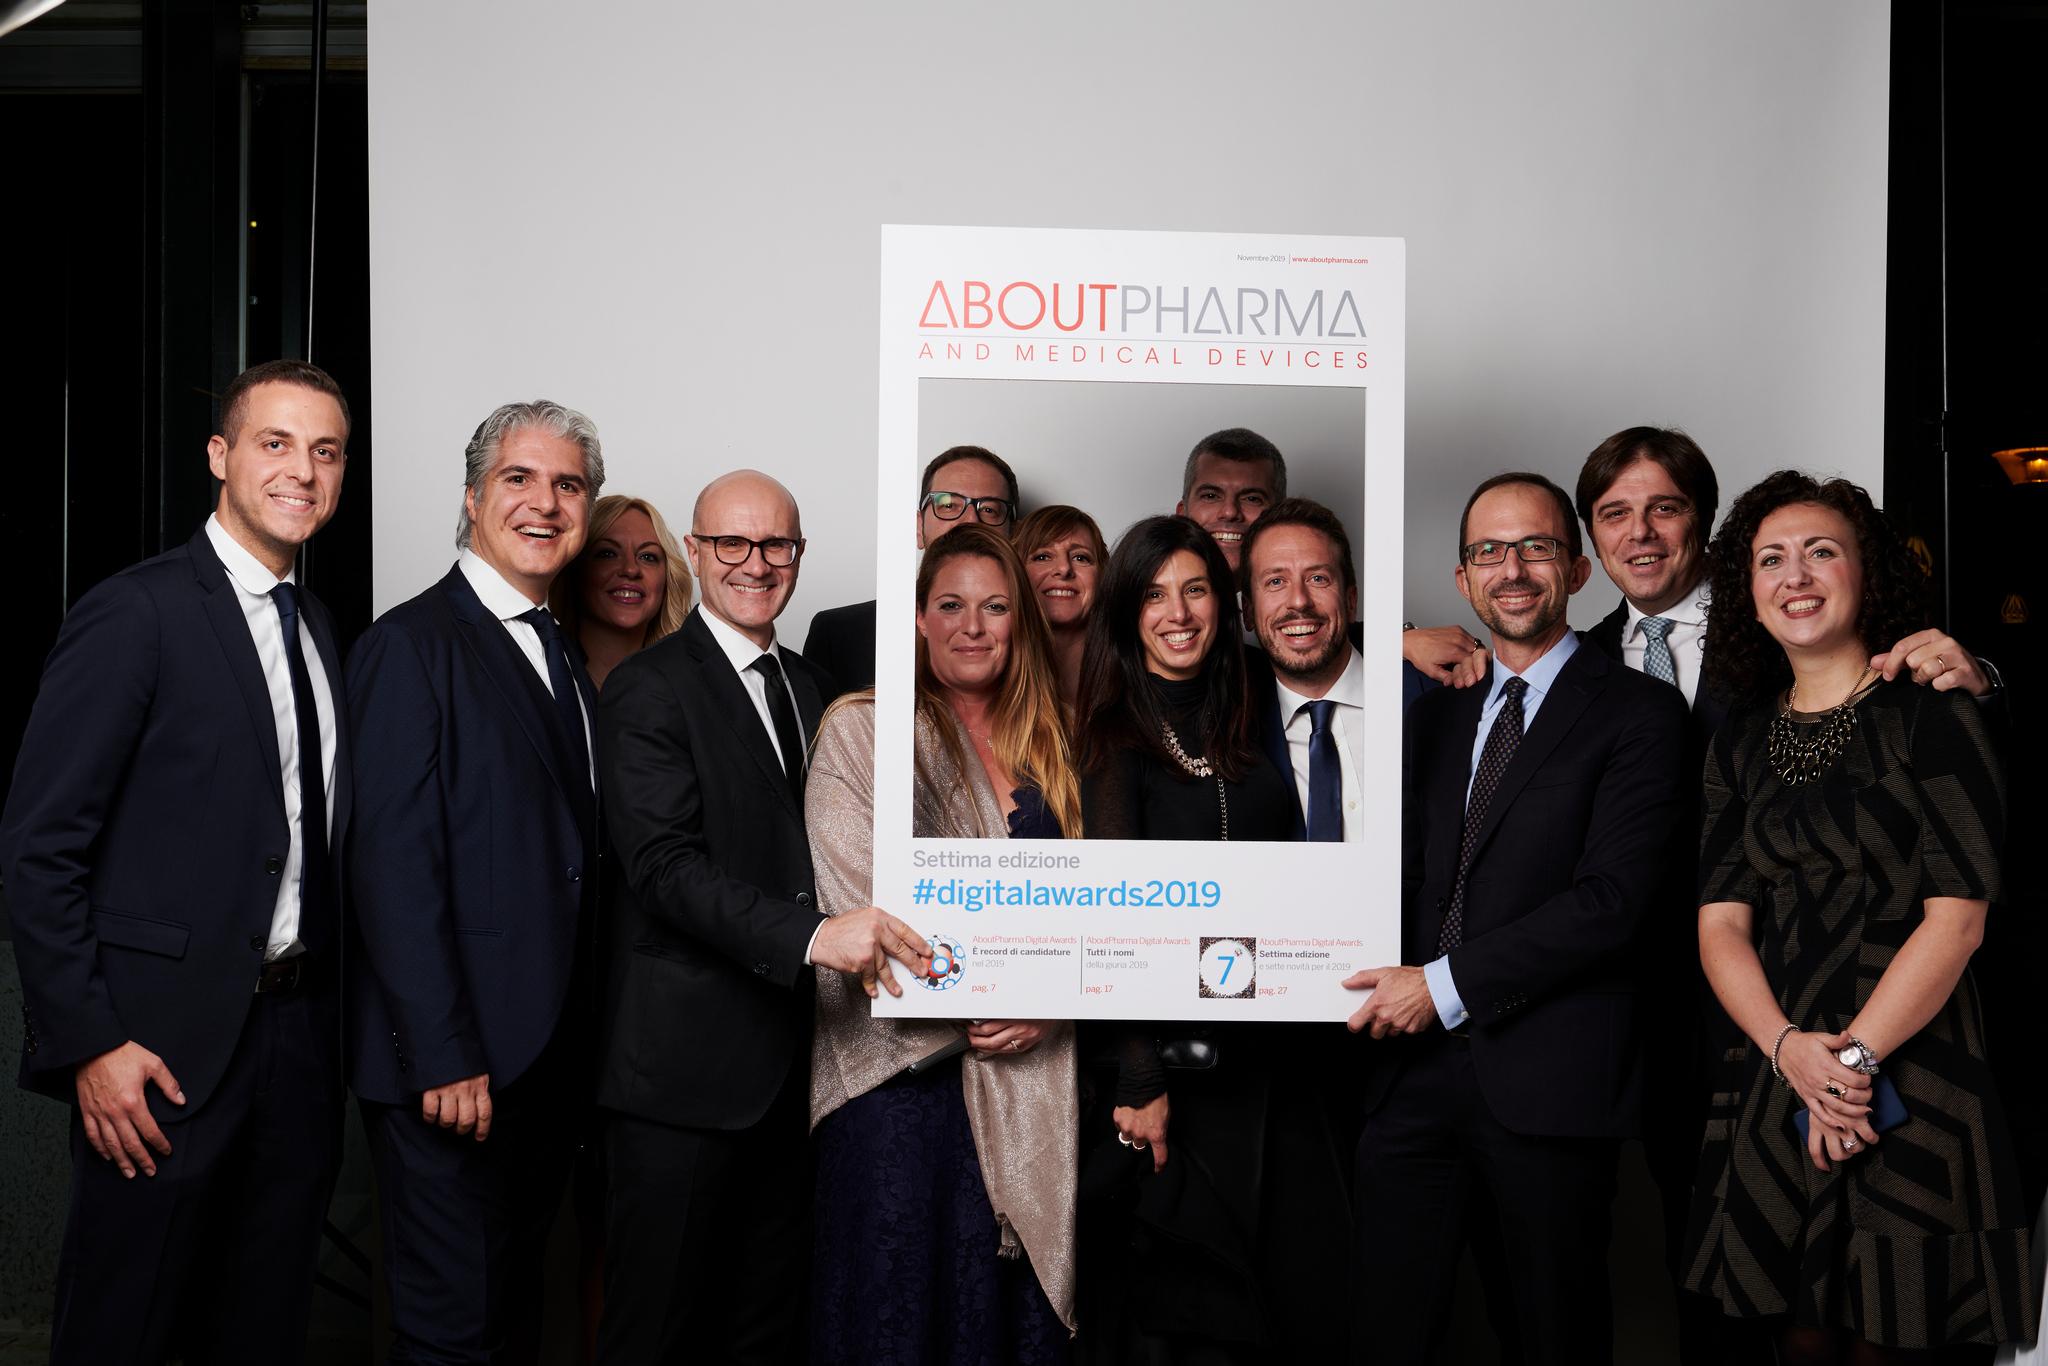 Photobooth AboutPharma Digital Awards 2019_44